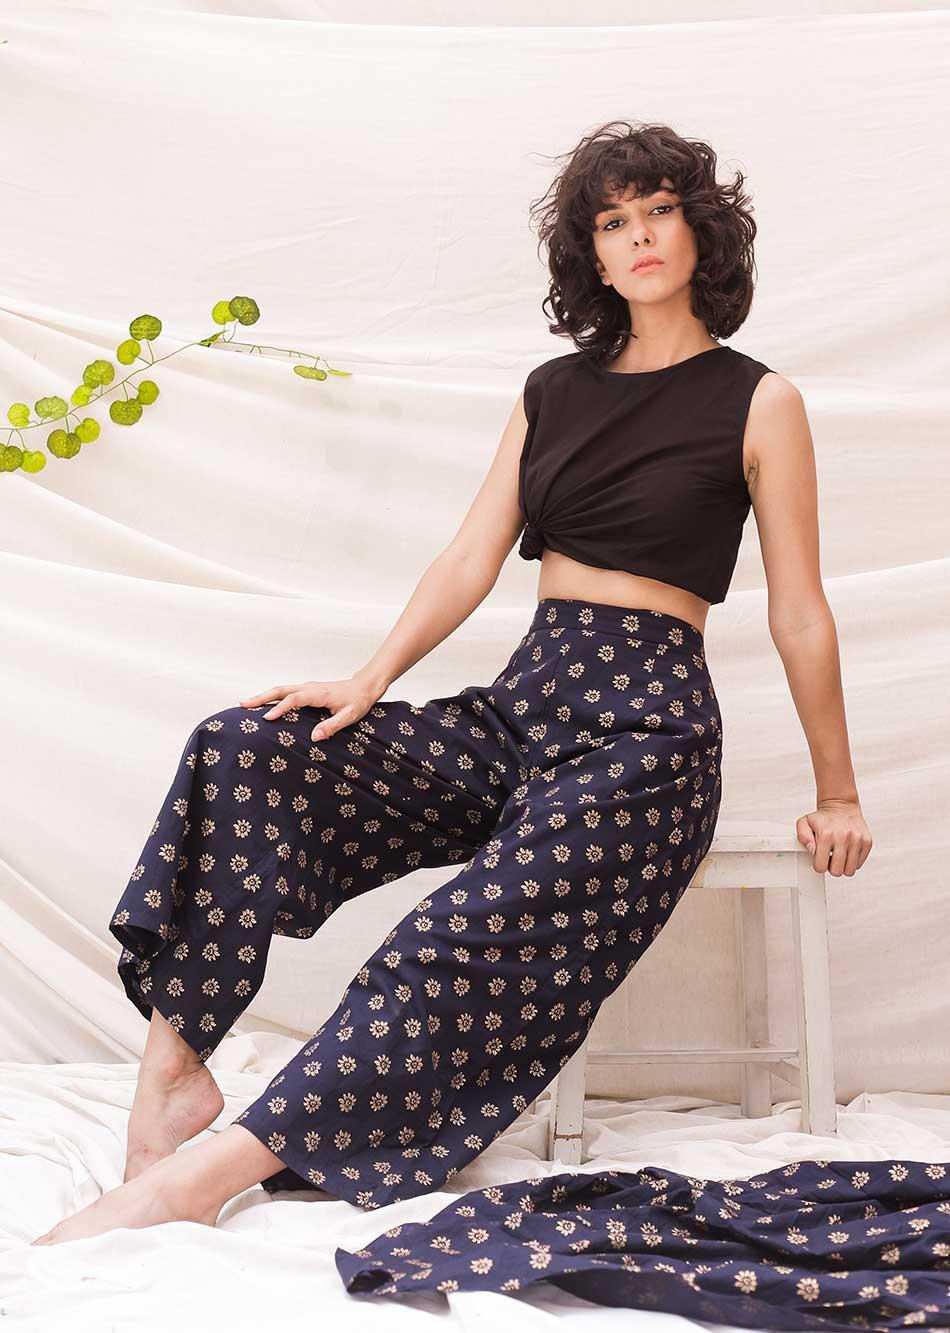 Glinting Blooming (Pants) By Jovi Fashion